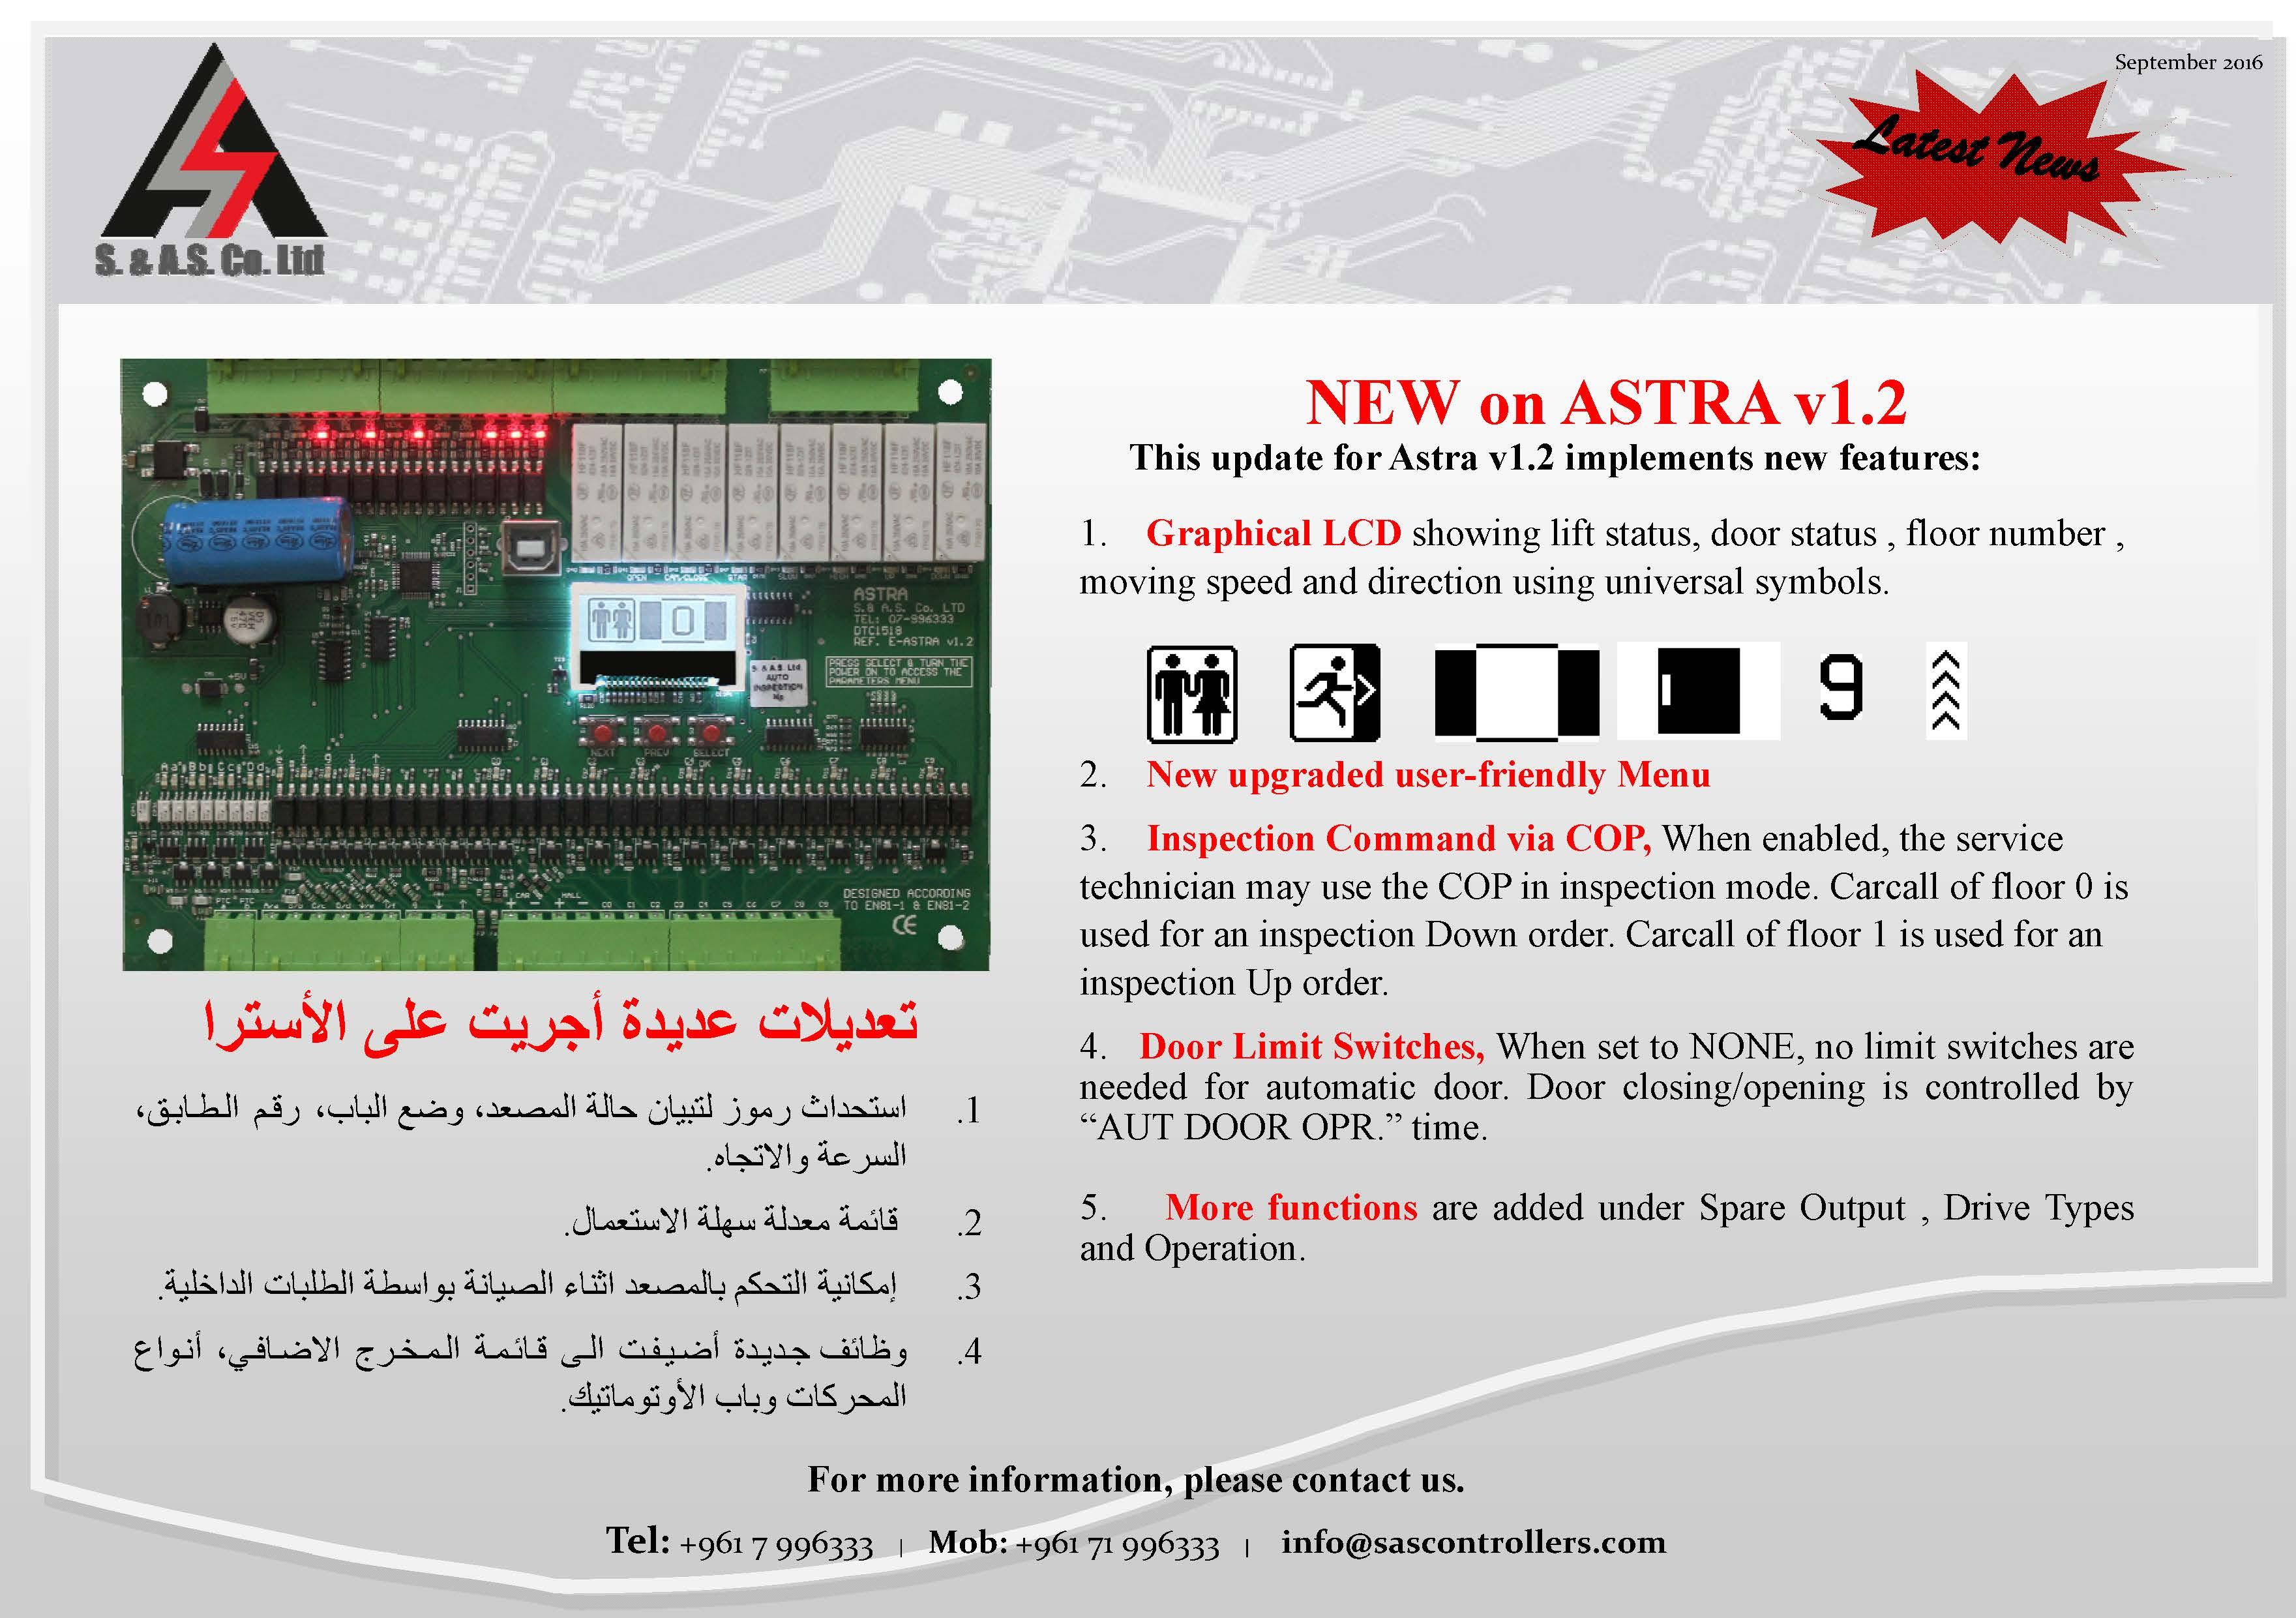 Astra v1.2